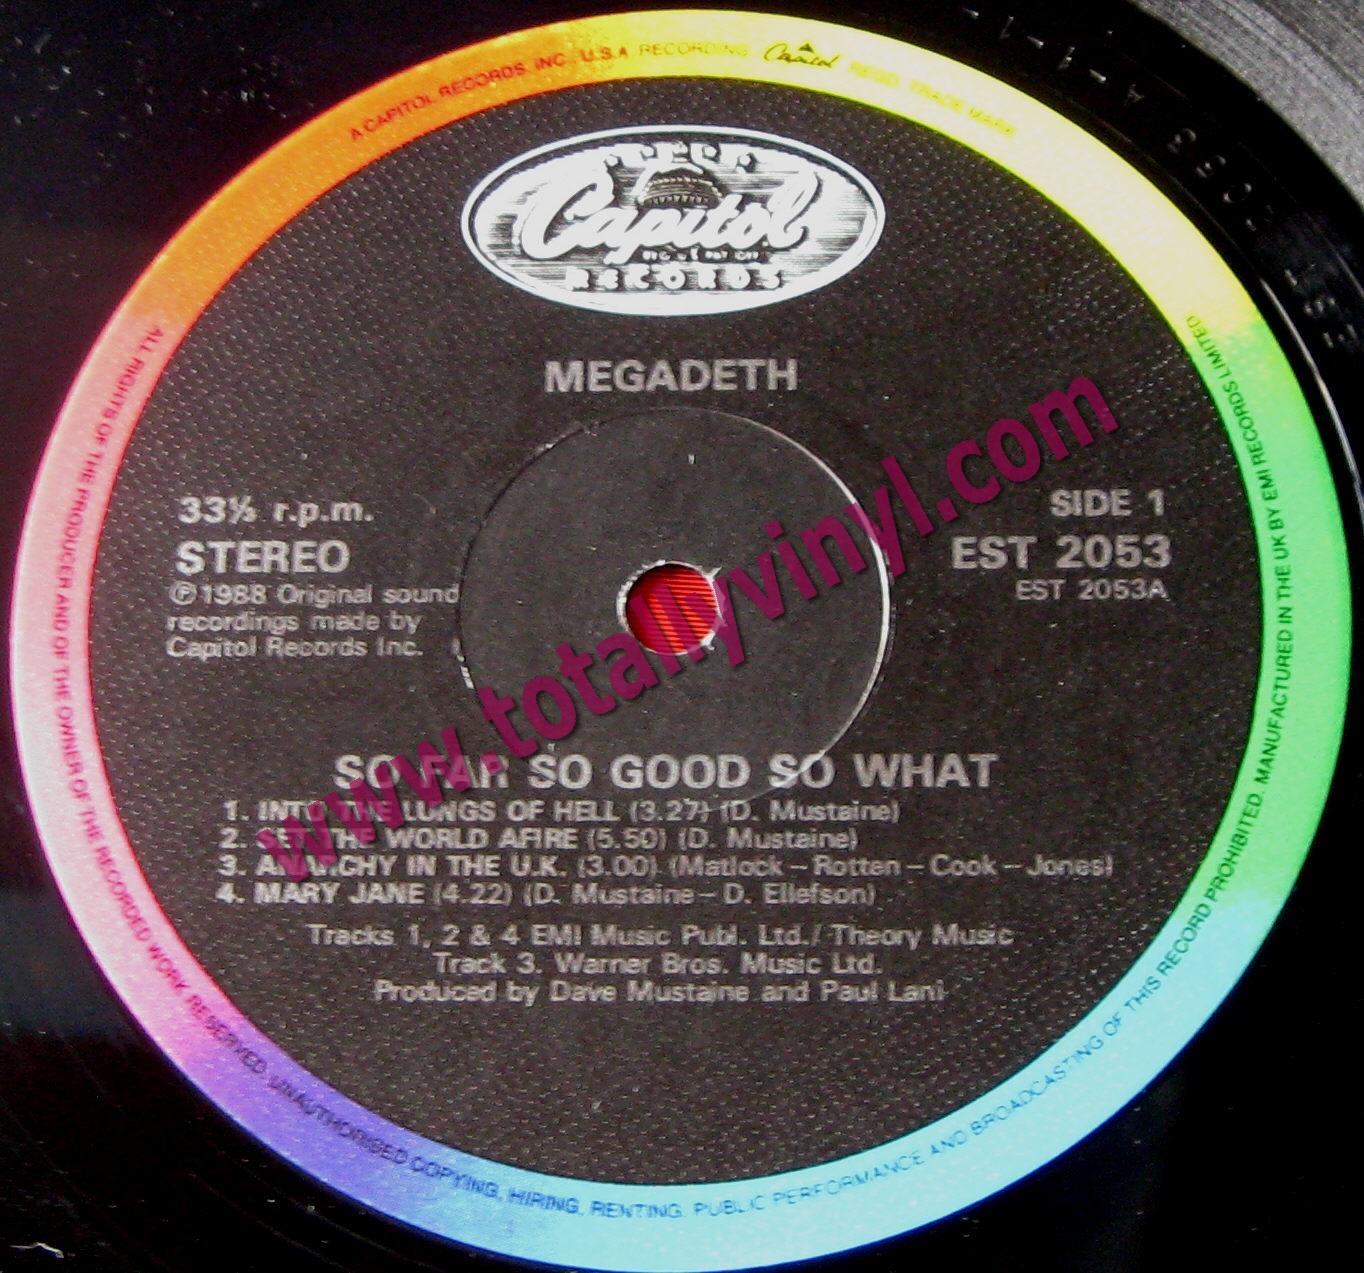 Totally Vinyl Records || Megadeth - So Far So Good So What